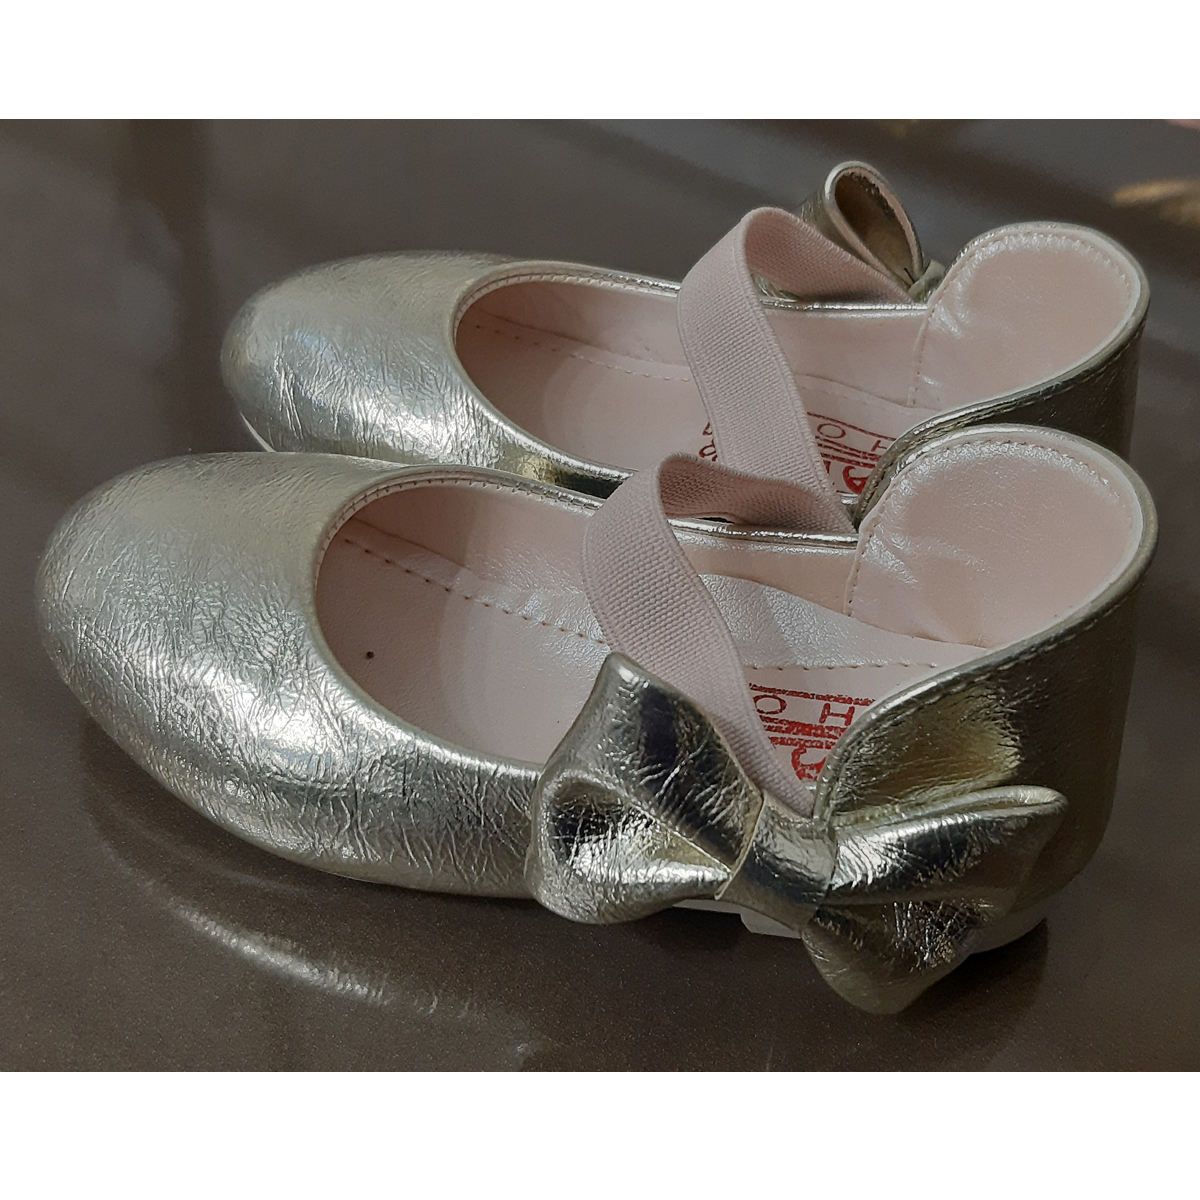 کفش دخترانه طرح پاپیون مدل 78041 -  - 2